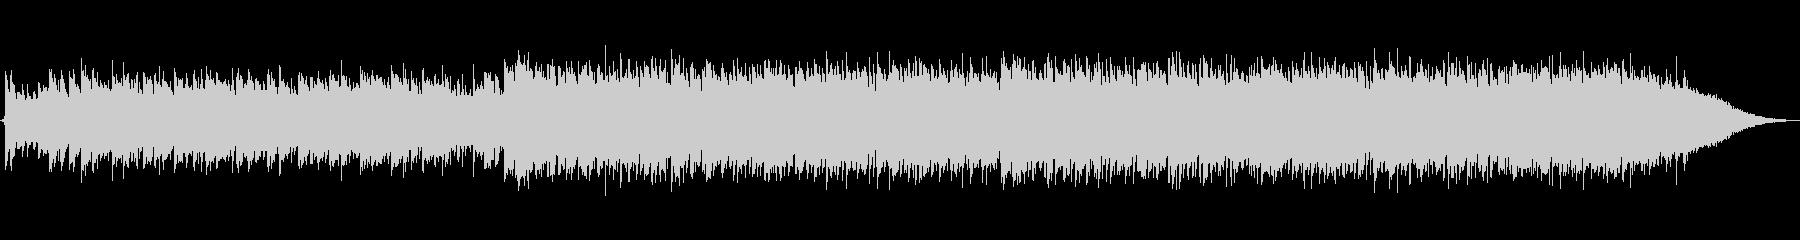 Opening / Cool flamenco EDM's unreproduced waveform